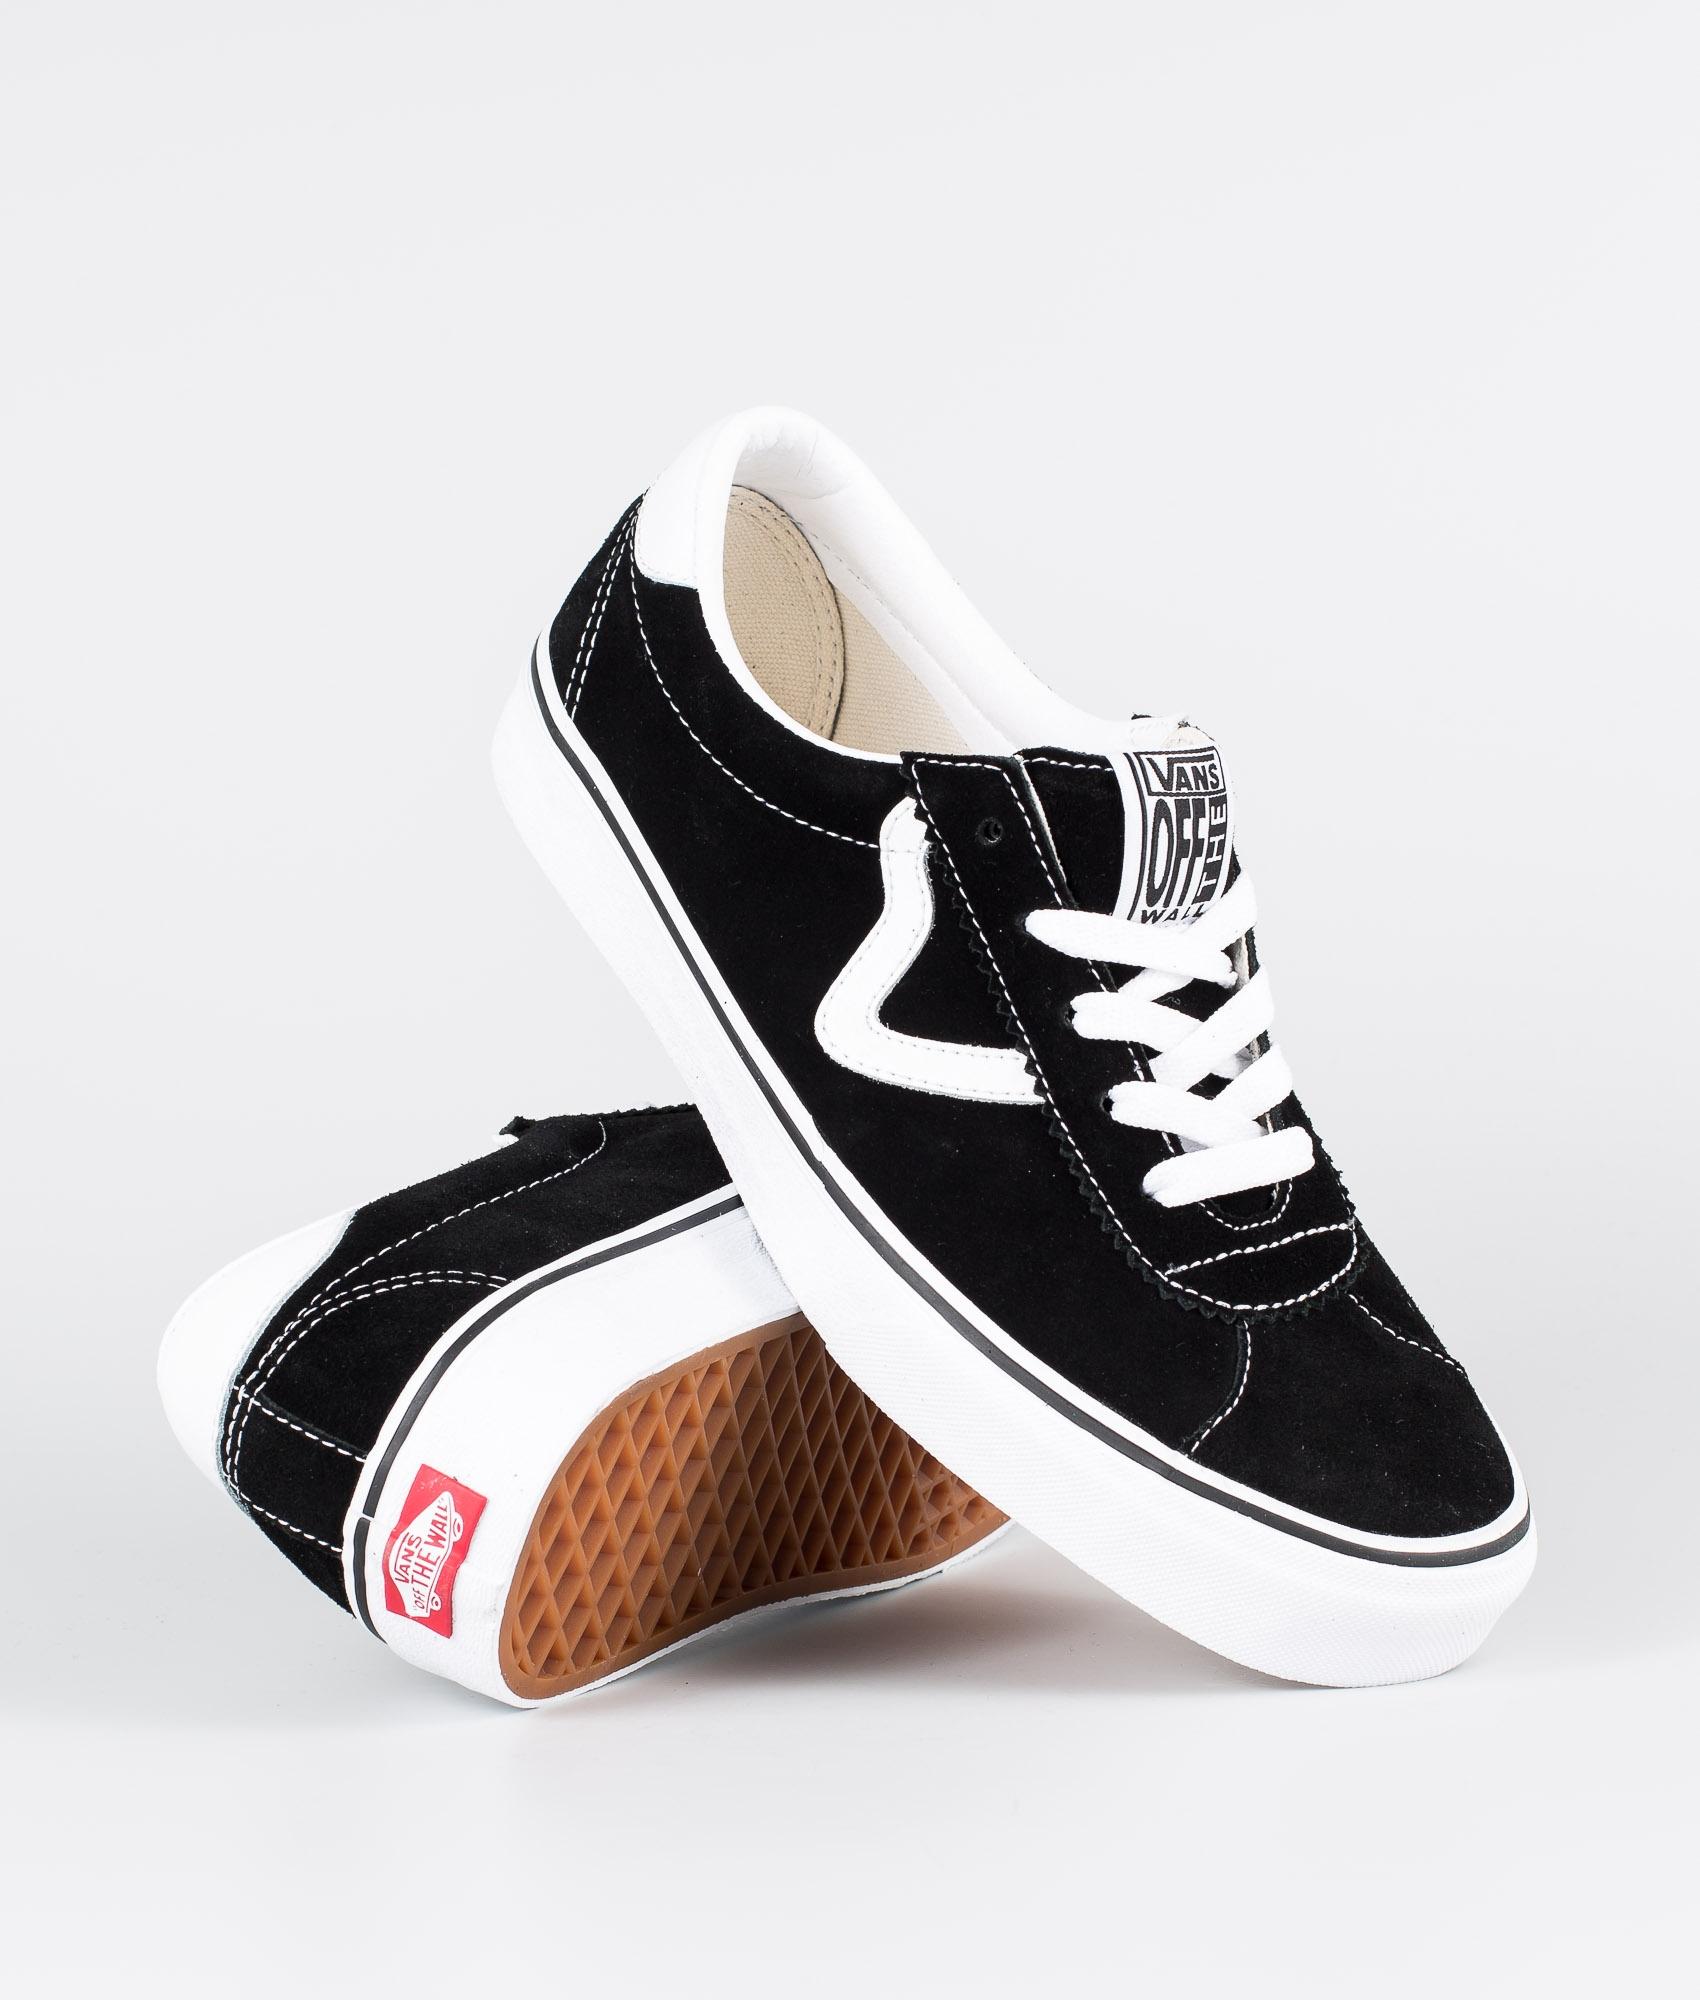 chaussure de sport vans